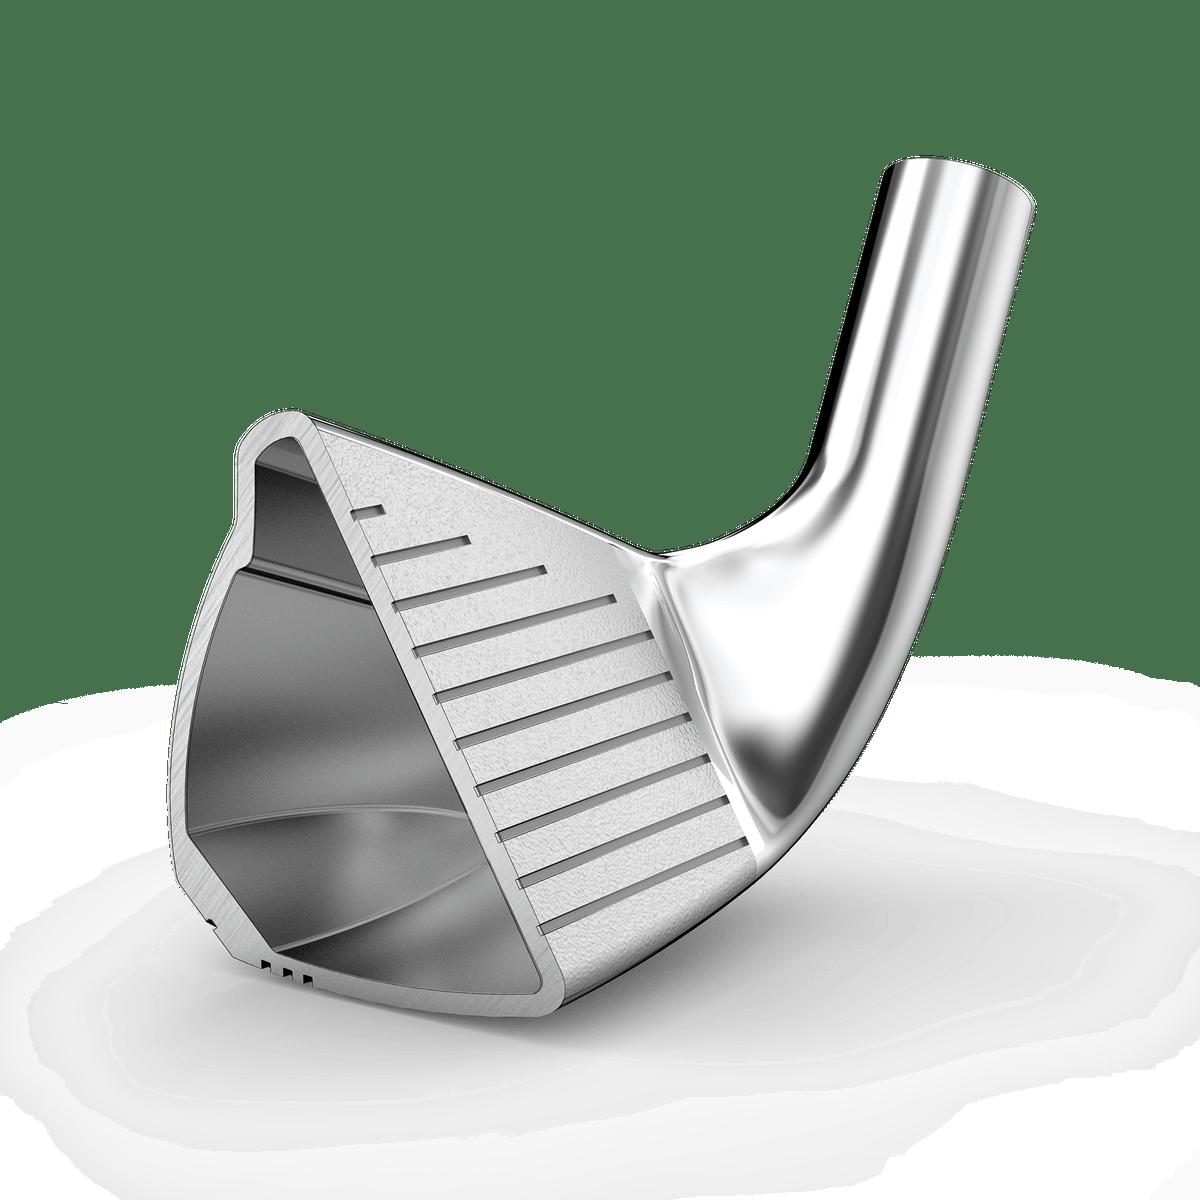 Wilson Launch Pad Iron Set